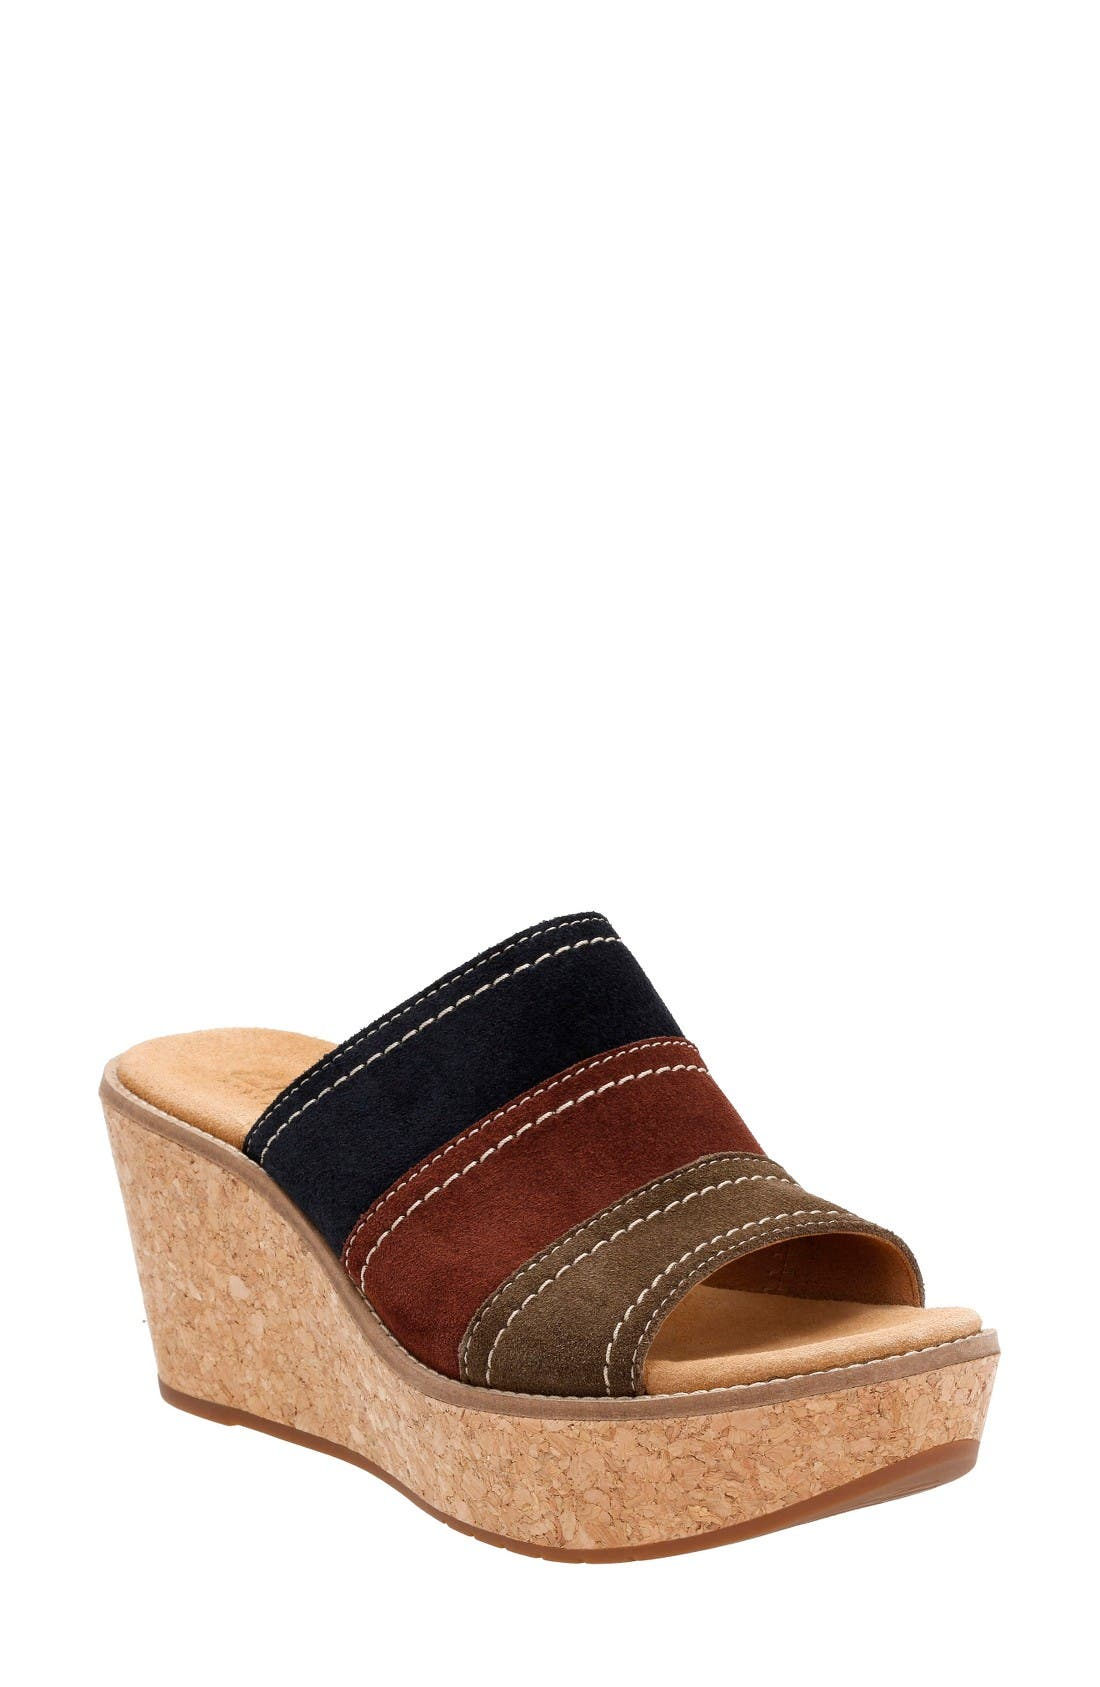 Clarks® Aisley Lily Wedge Sandal (Women)